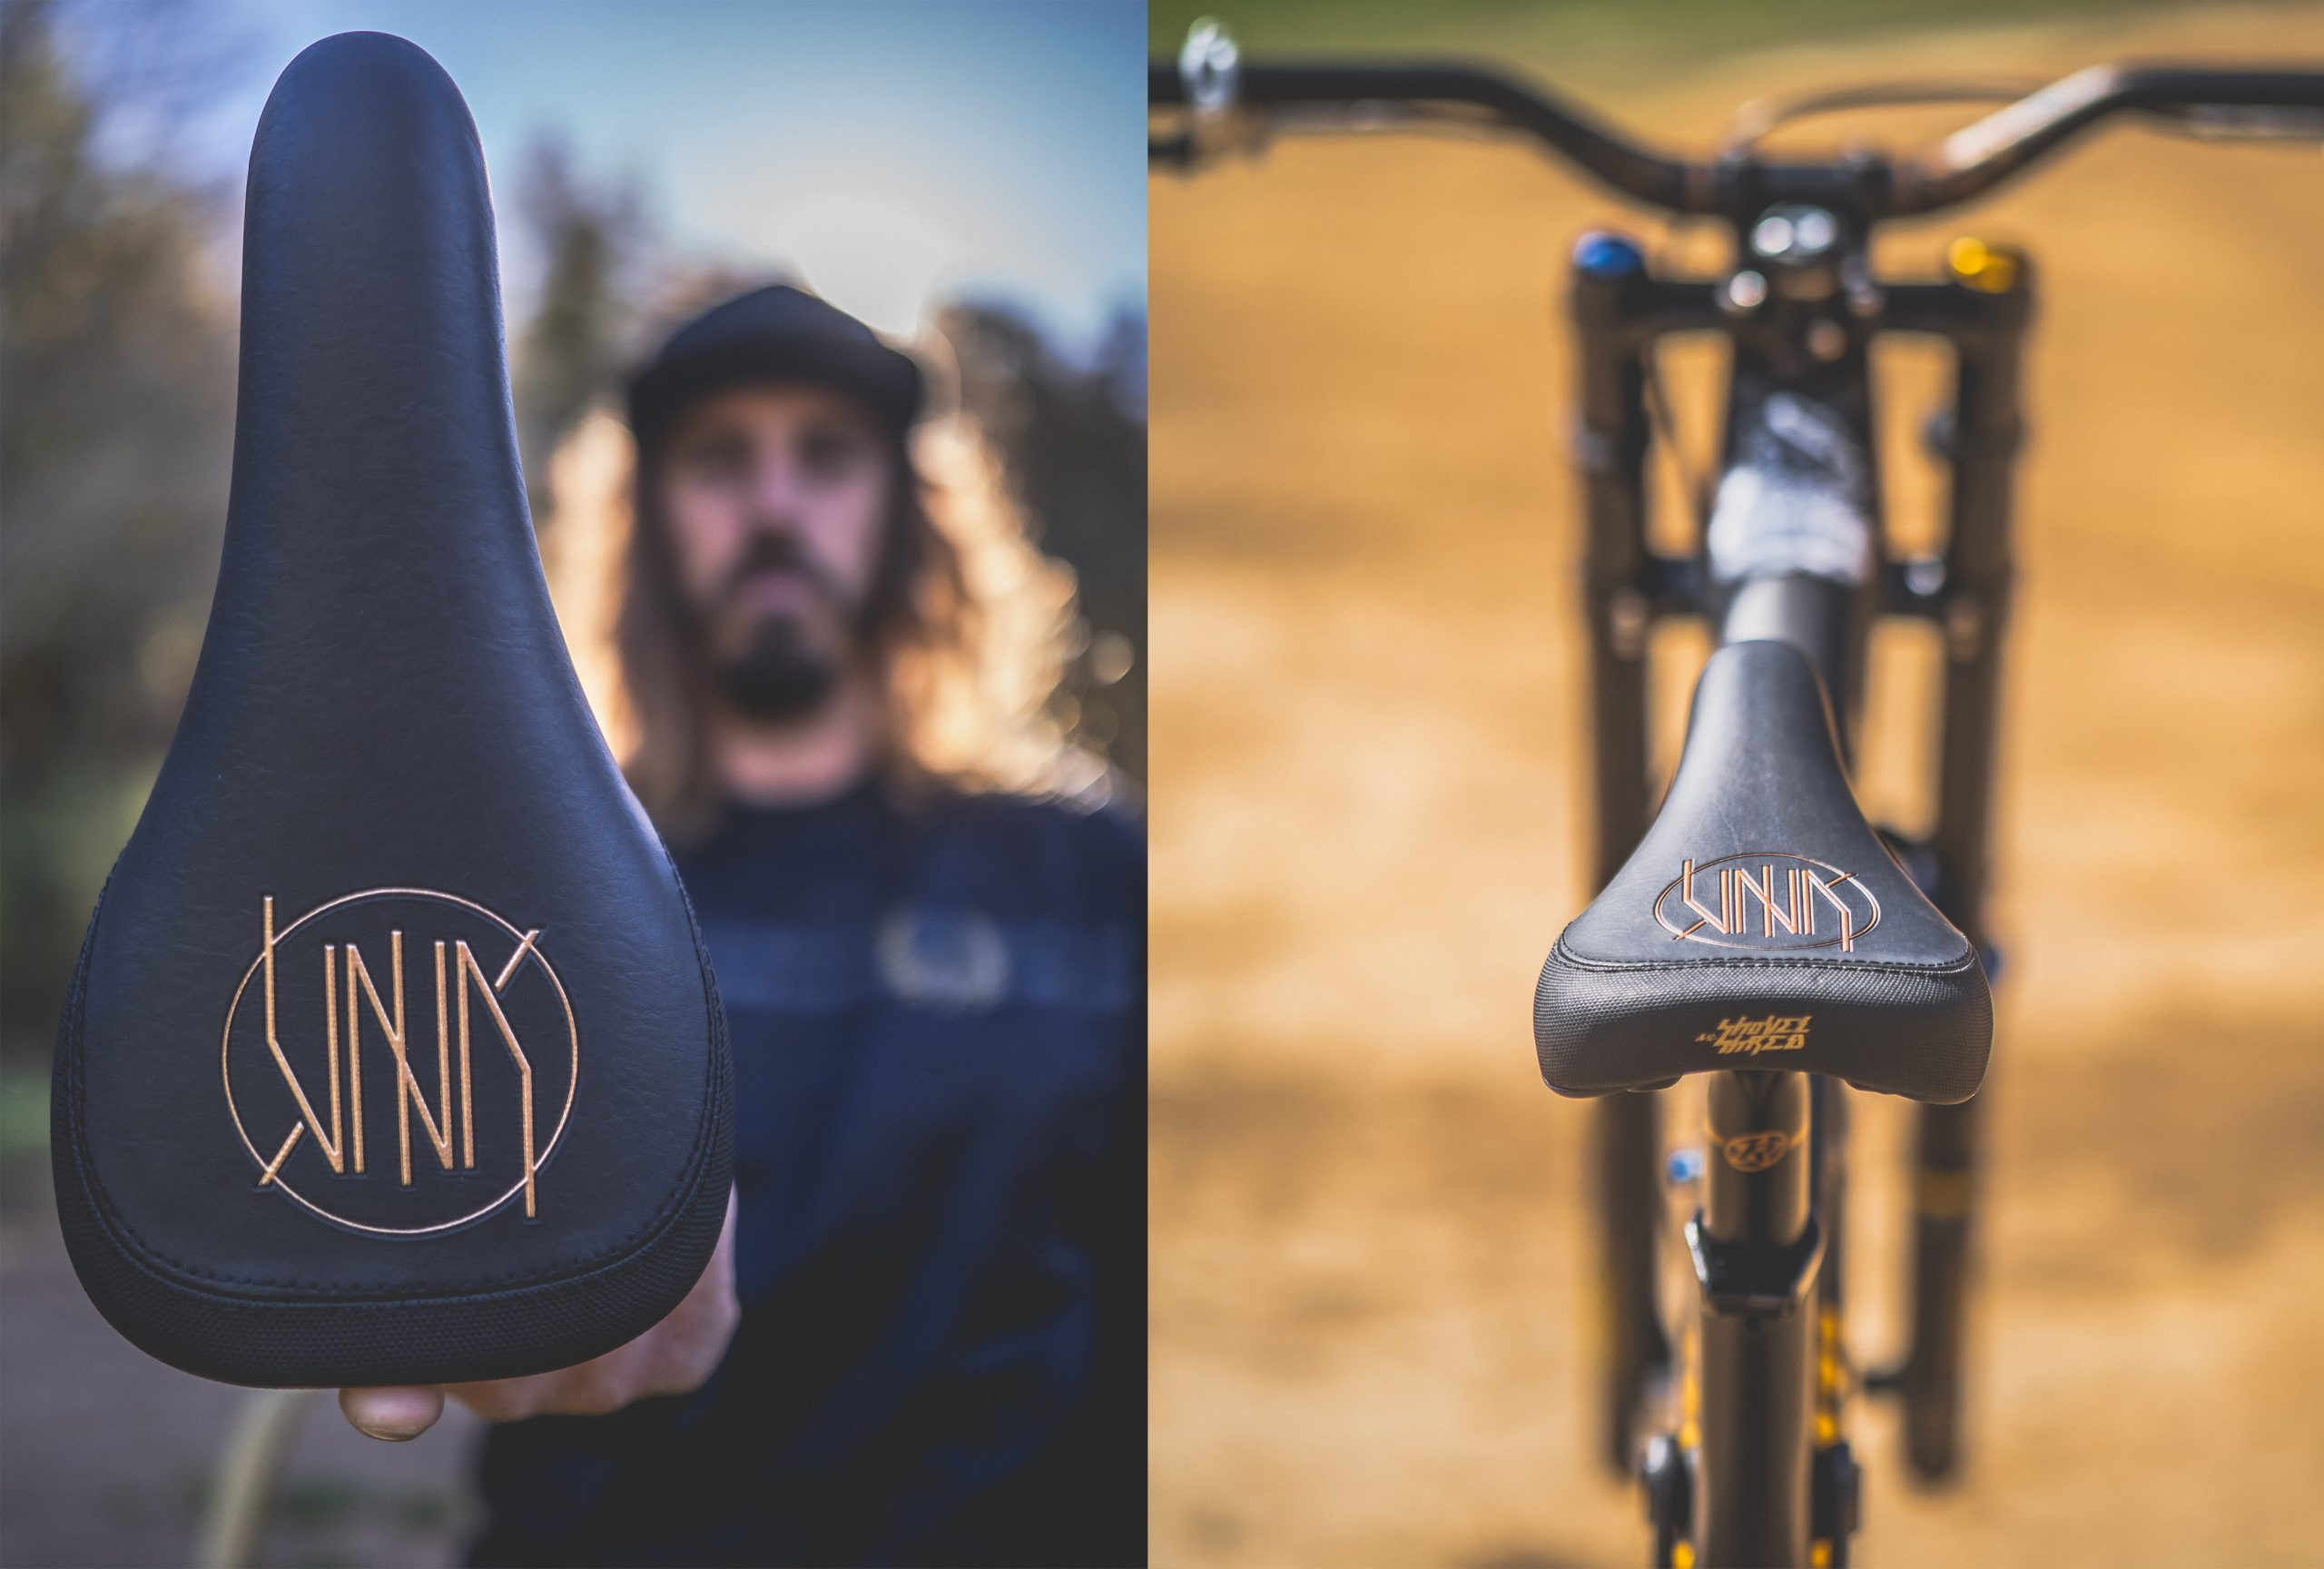 nico vink signature serie copper 07 scaled